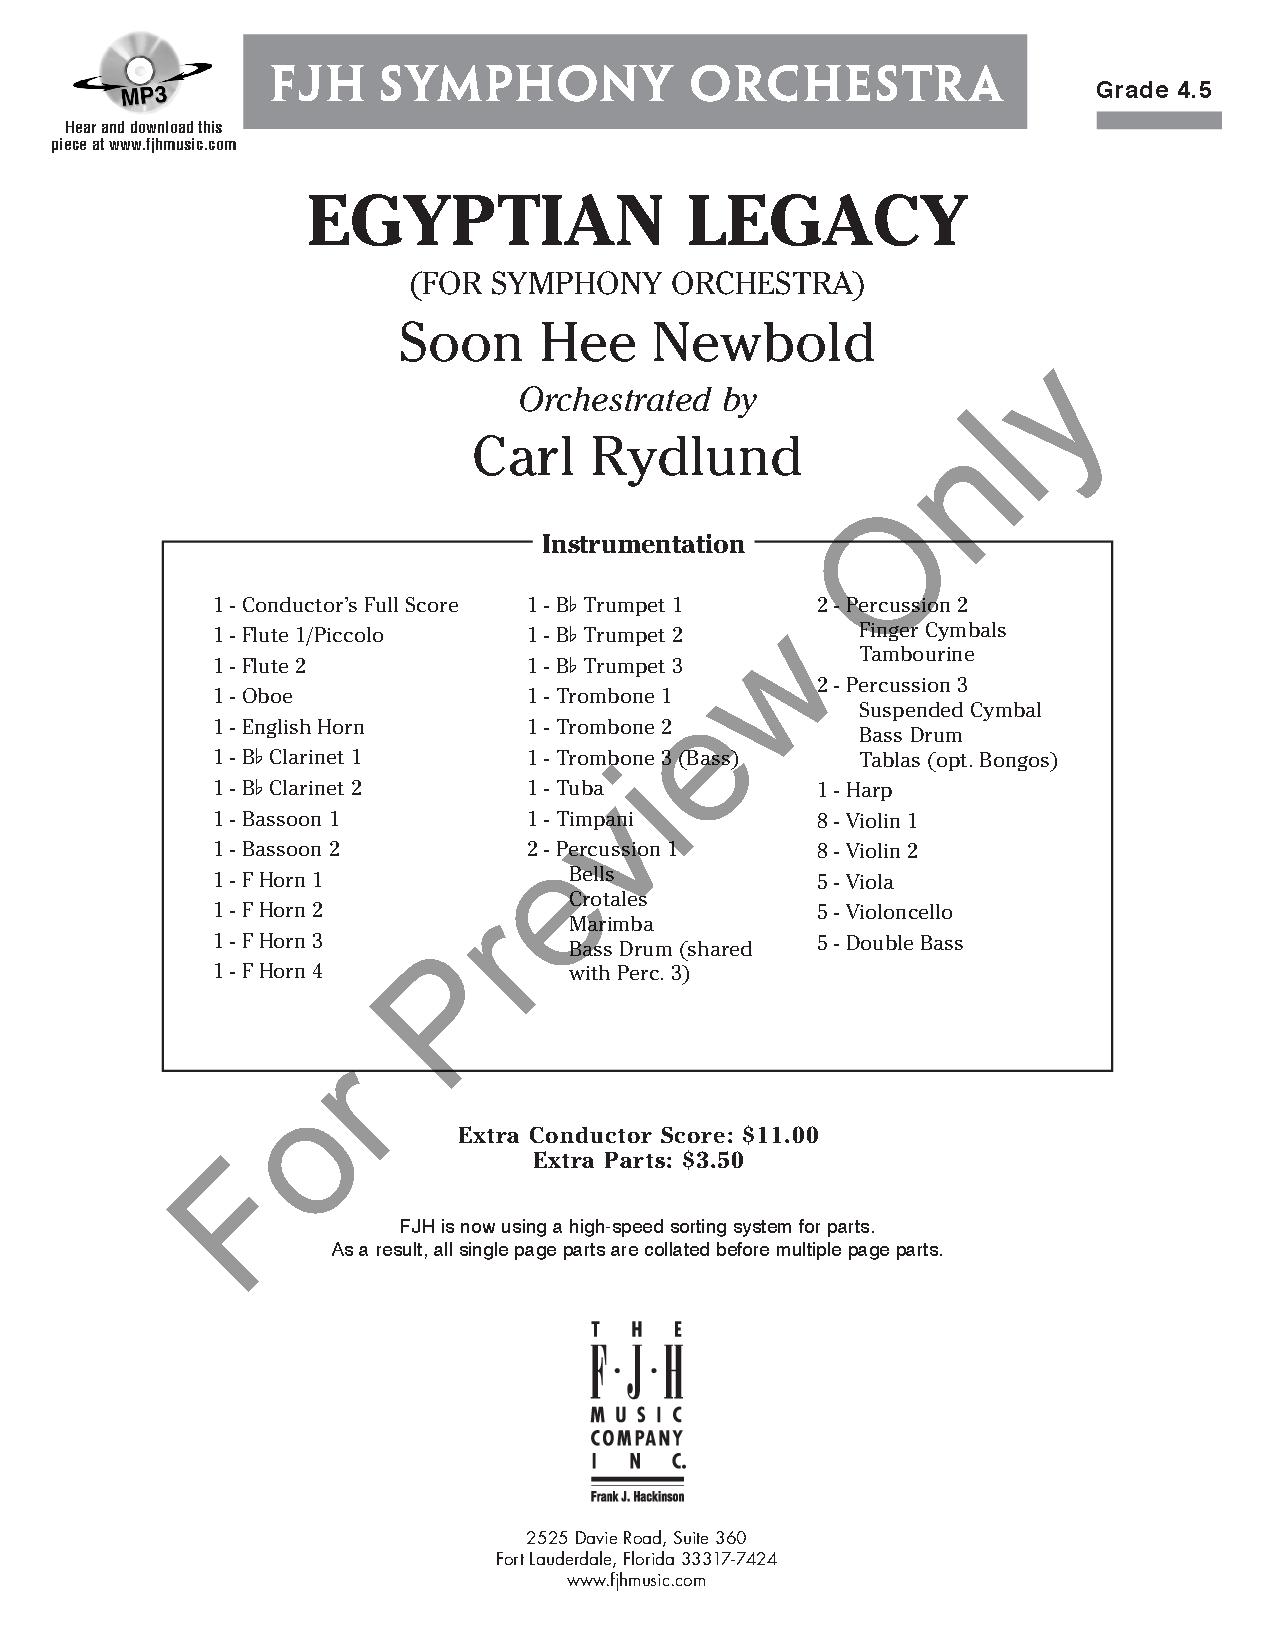 egyptian legacy by soon hee newbold  arr  carl ryd